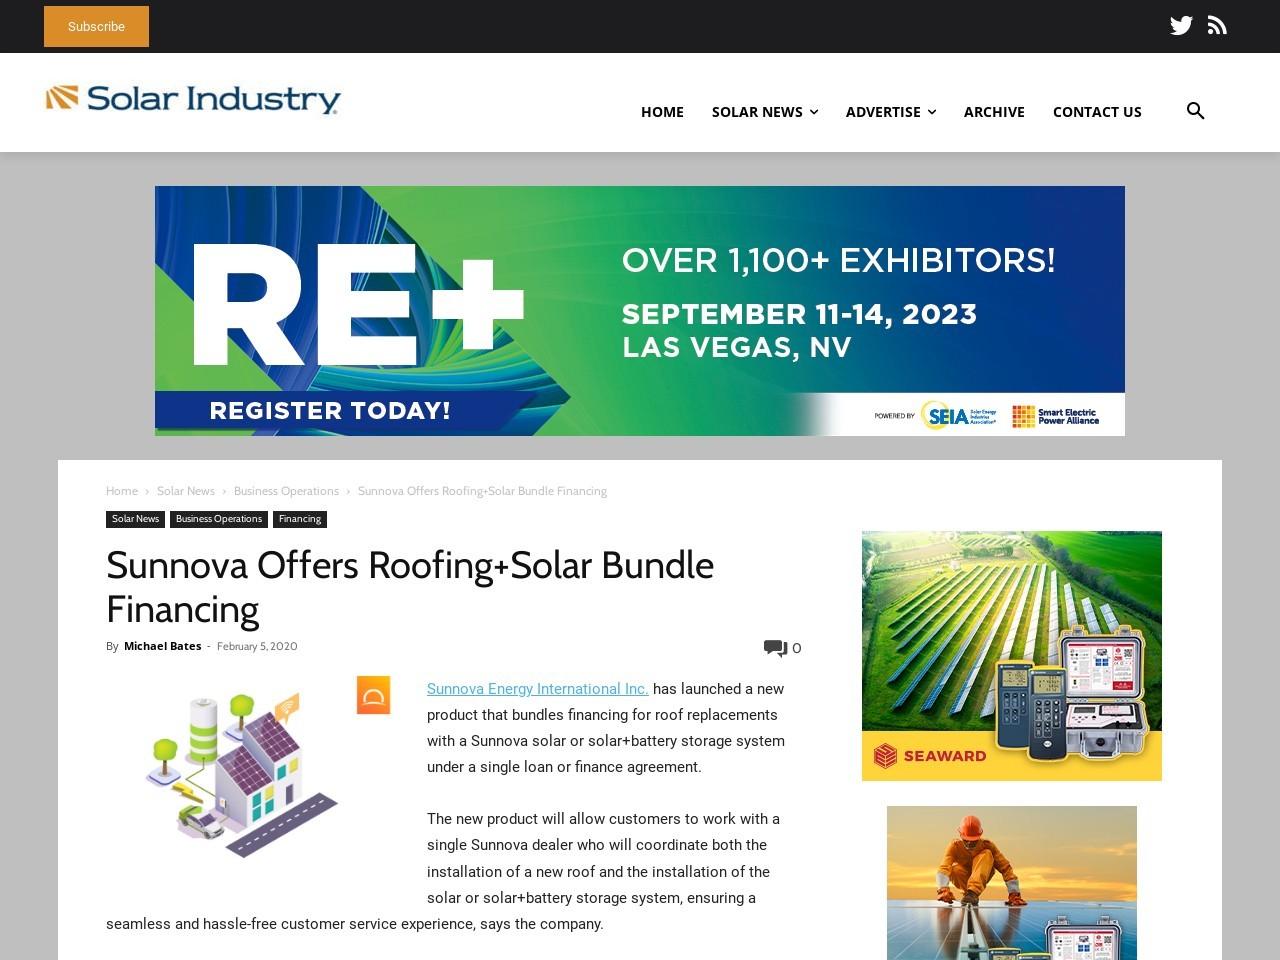 Sunnova Offers Roofing+Solar Bundle Financing